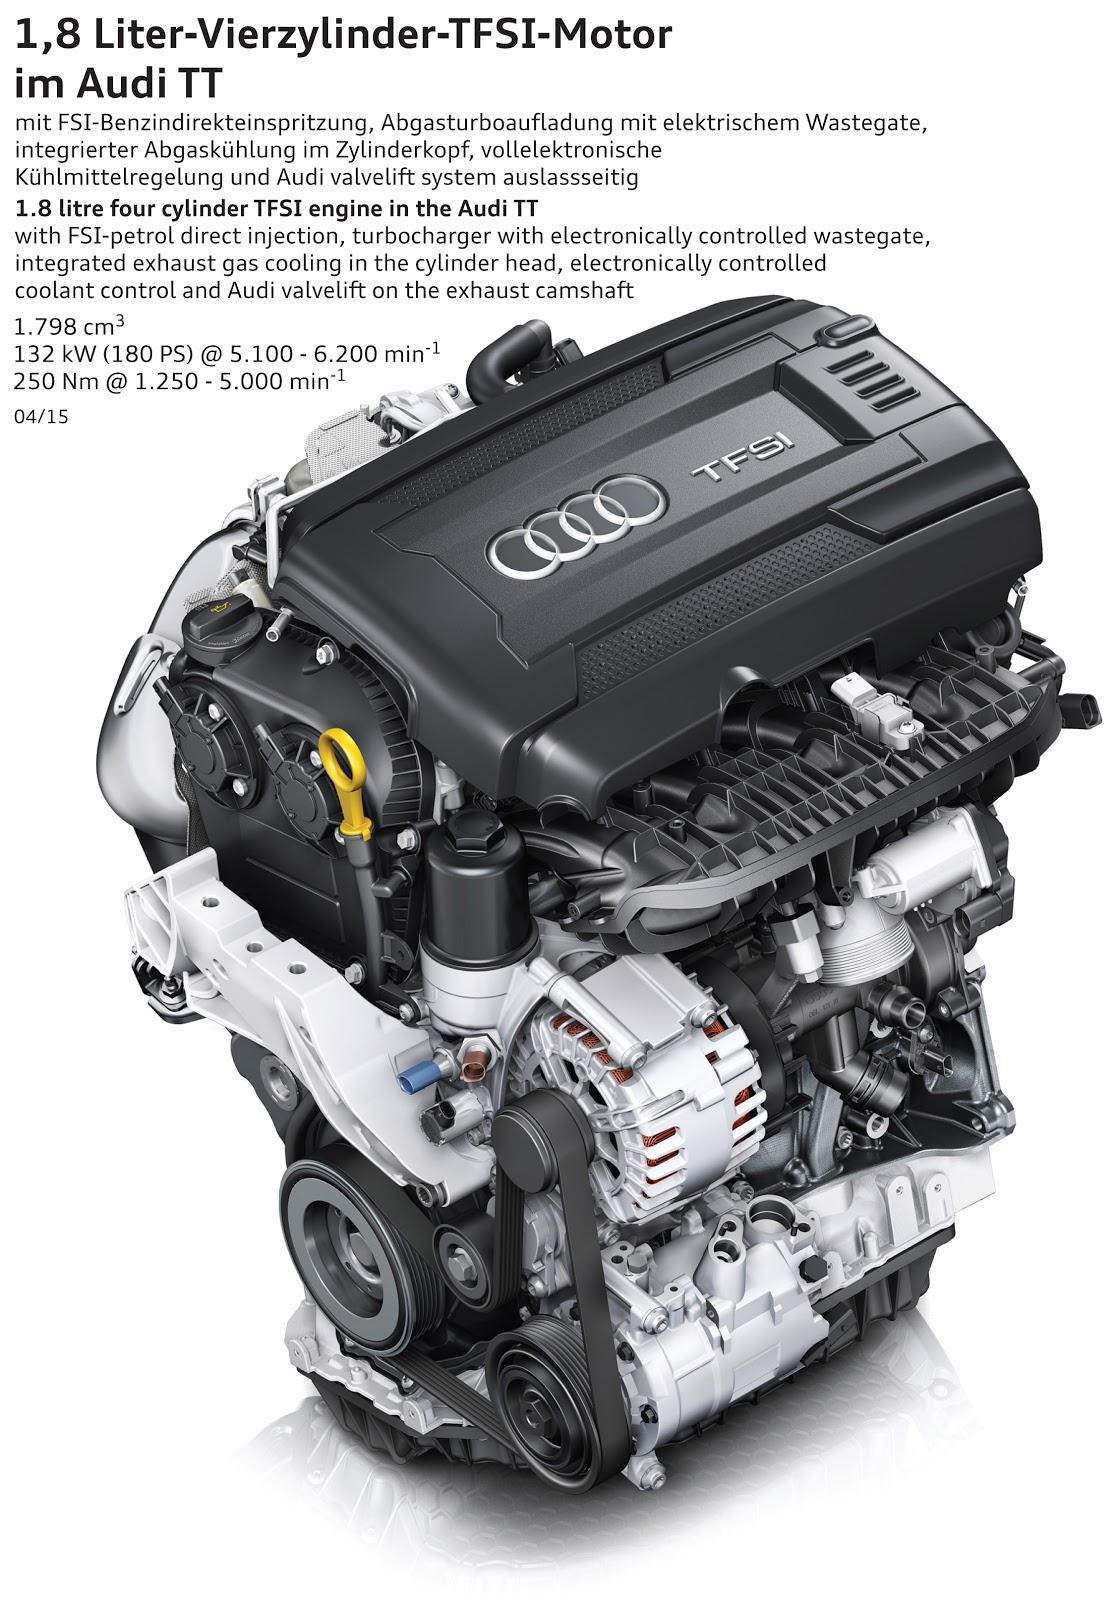 Nowy silnik w Audi TT - 1.8 TFSI